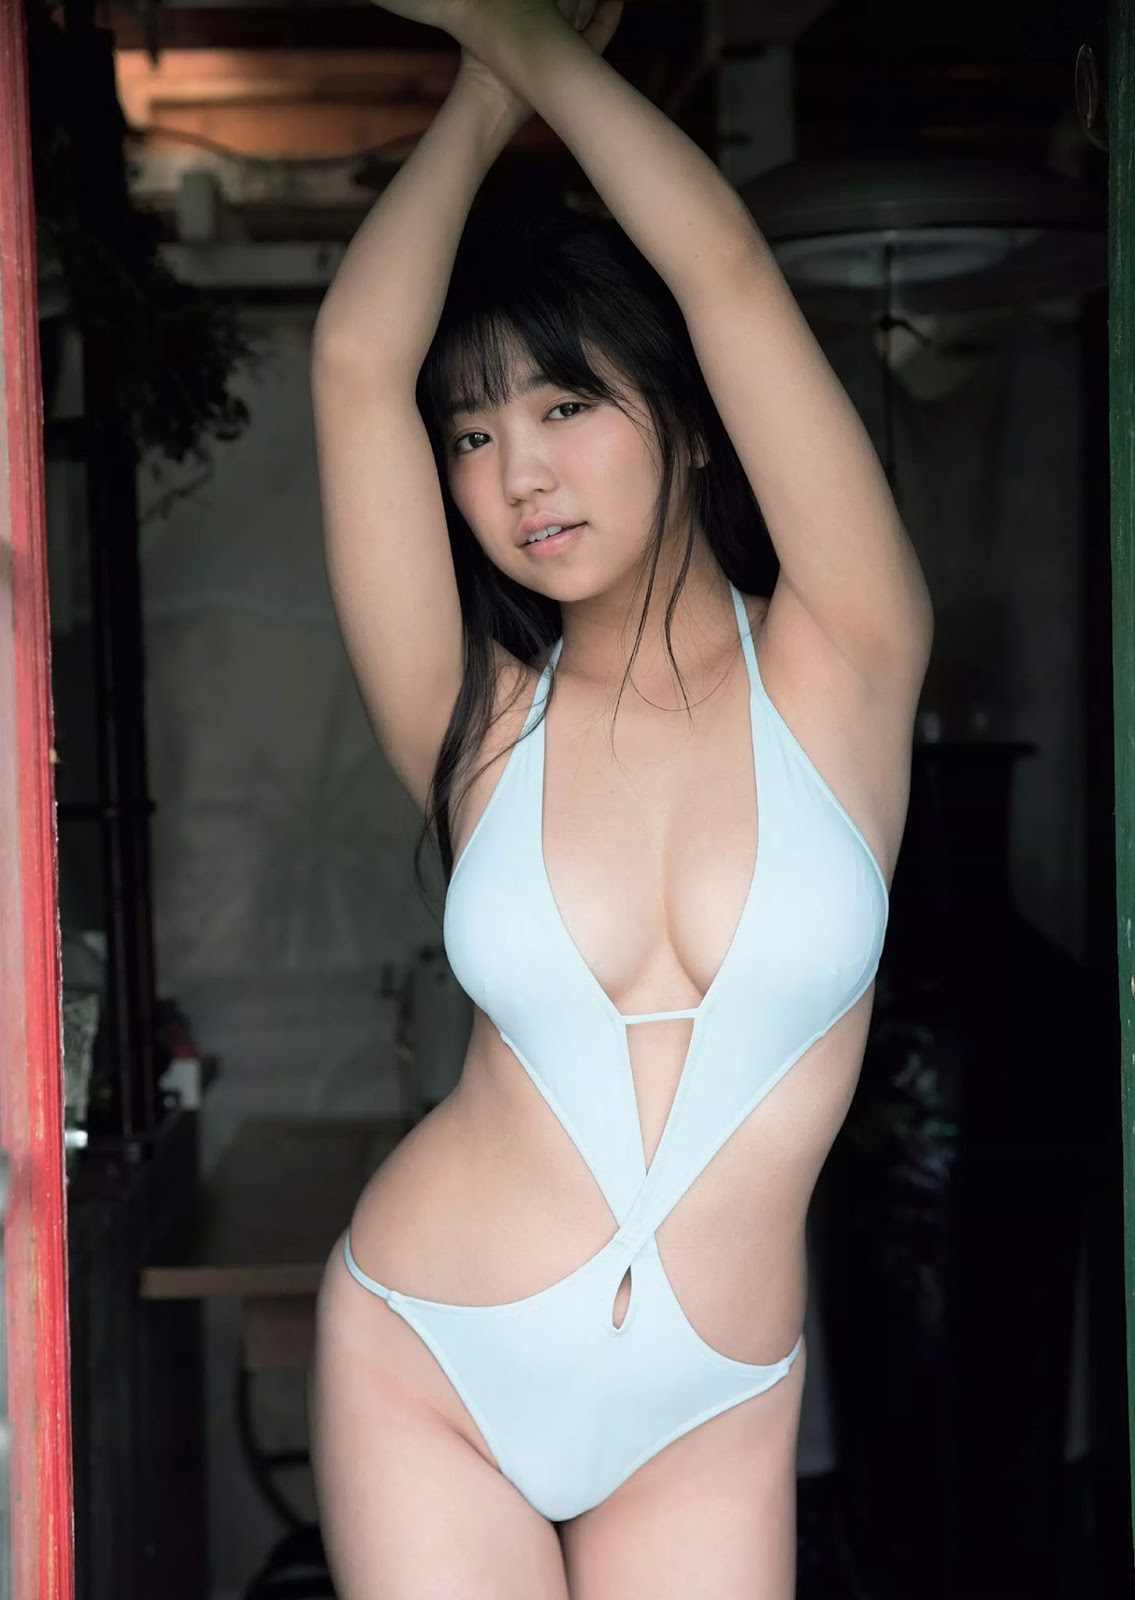 Ohara Yuno 大原優乃, Weekly Playboy 2018 No.19-20 (週刊プレイボーイ 2018年19-20号)